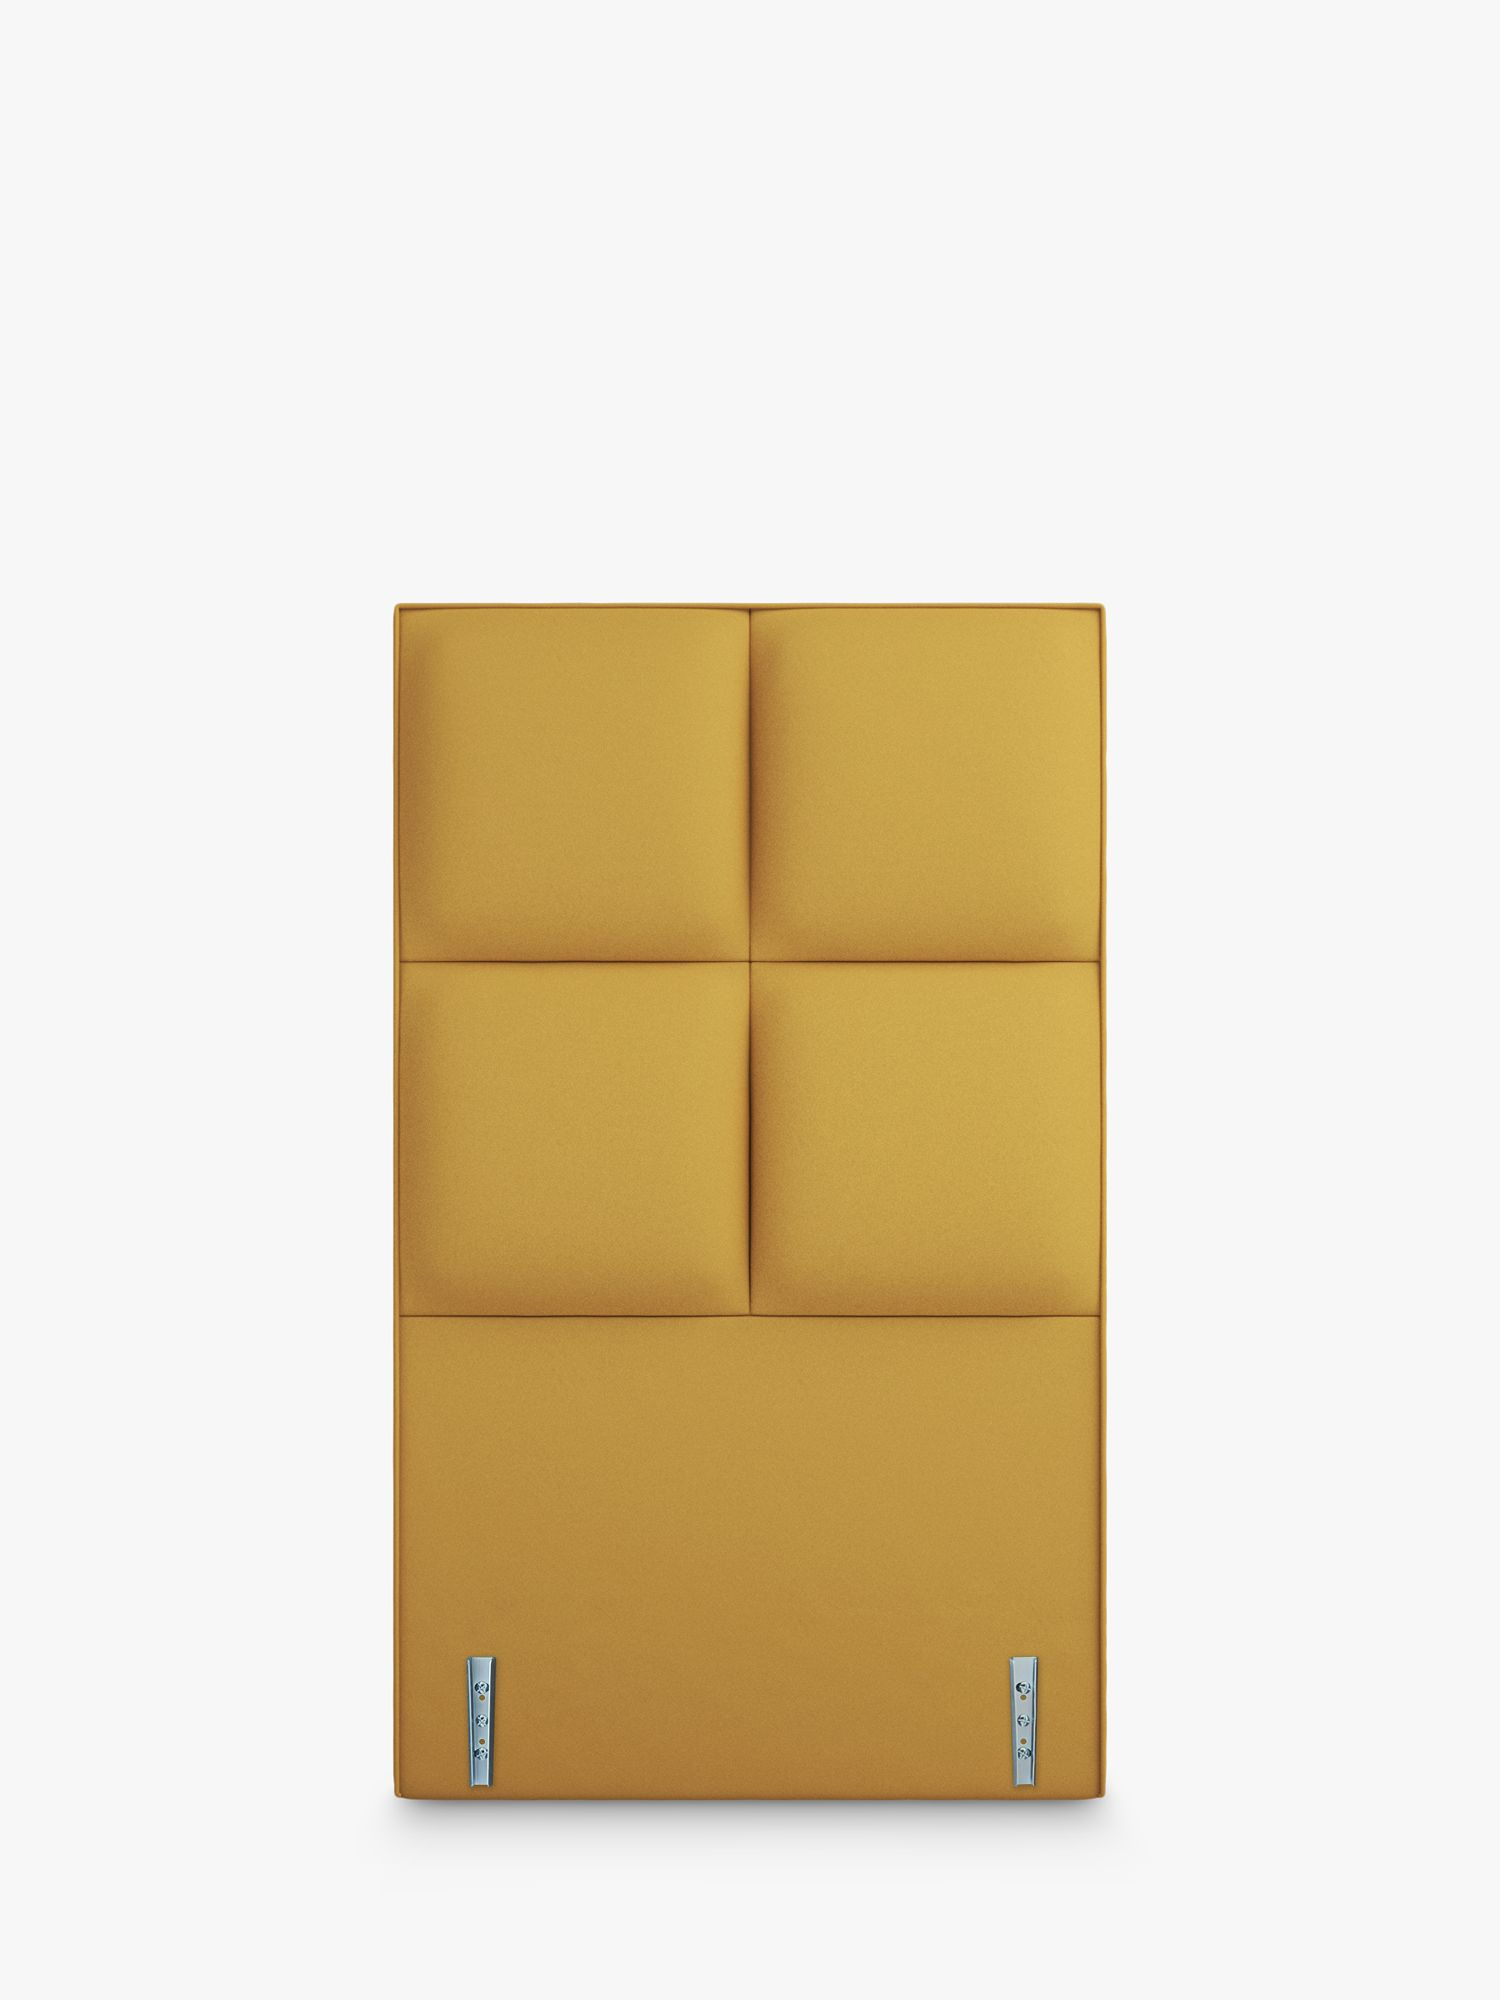 Vispring Ares Full Depth Upholstered Headboard, Single, FSC-Certified (Chipboard)